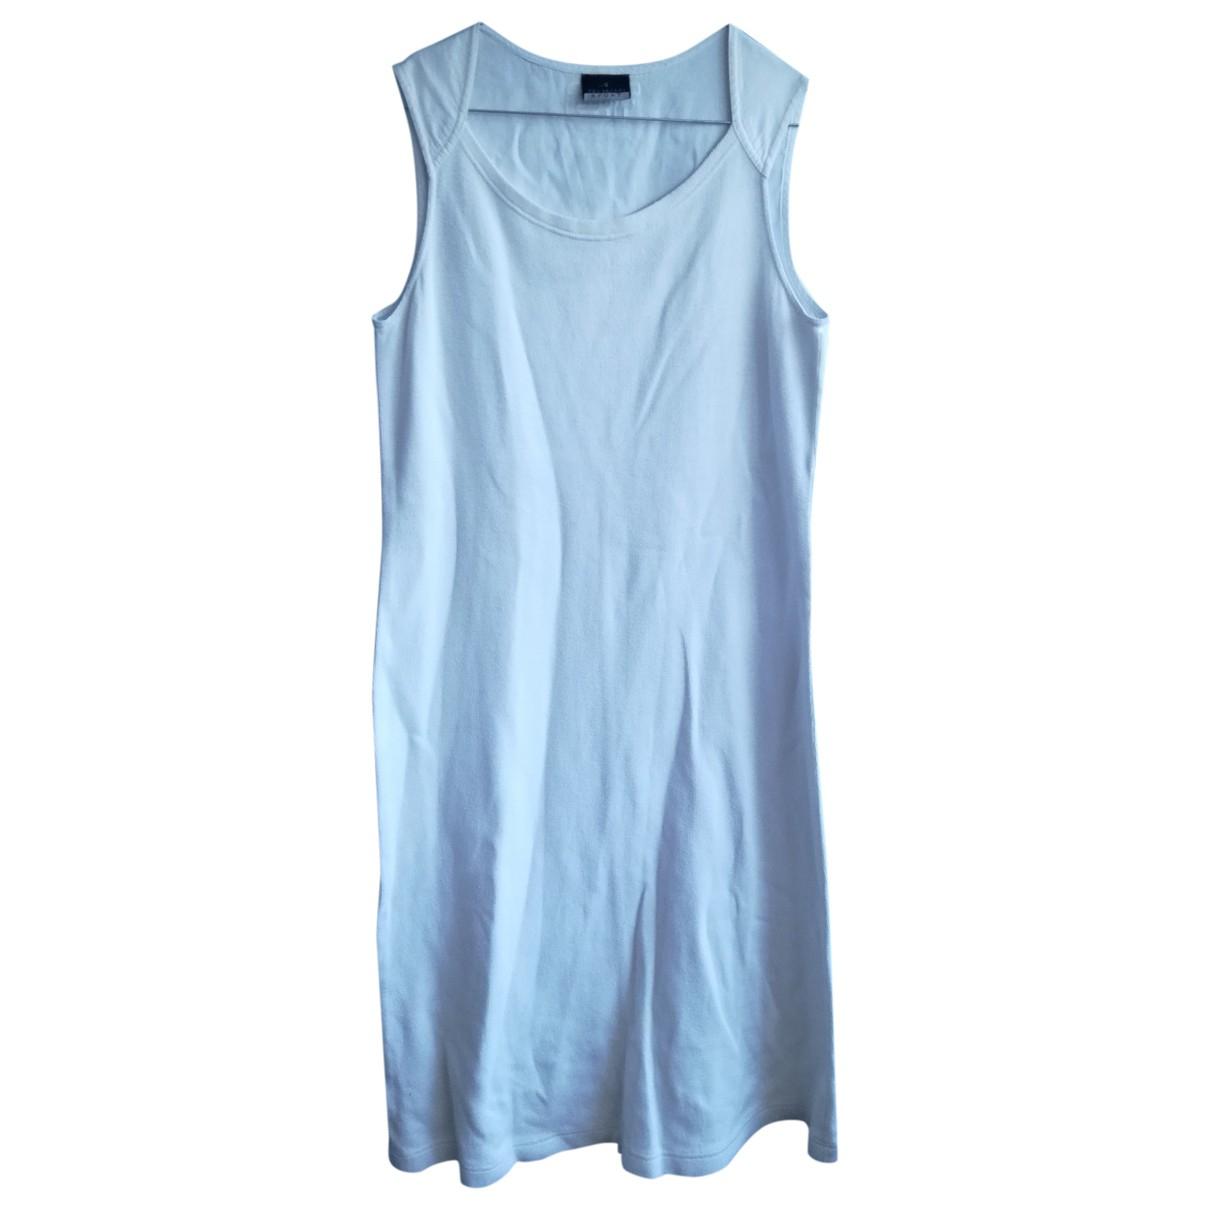 Trussardi Jeans \N White Cotton dress for Women 44 IT